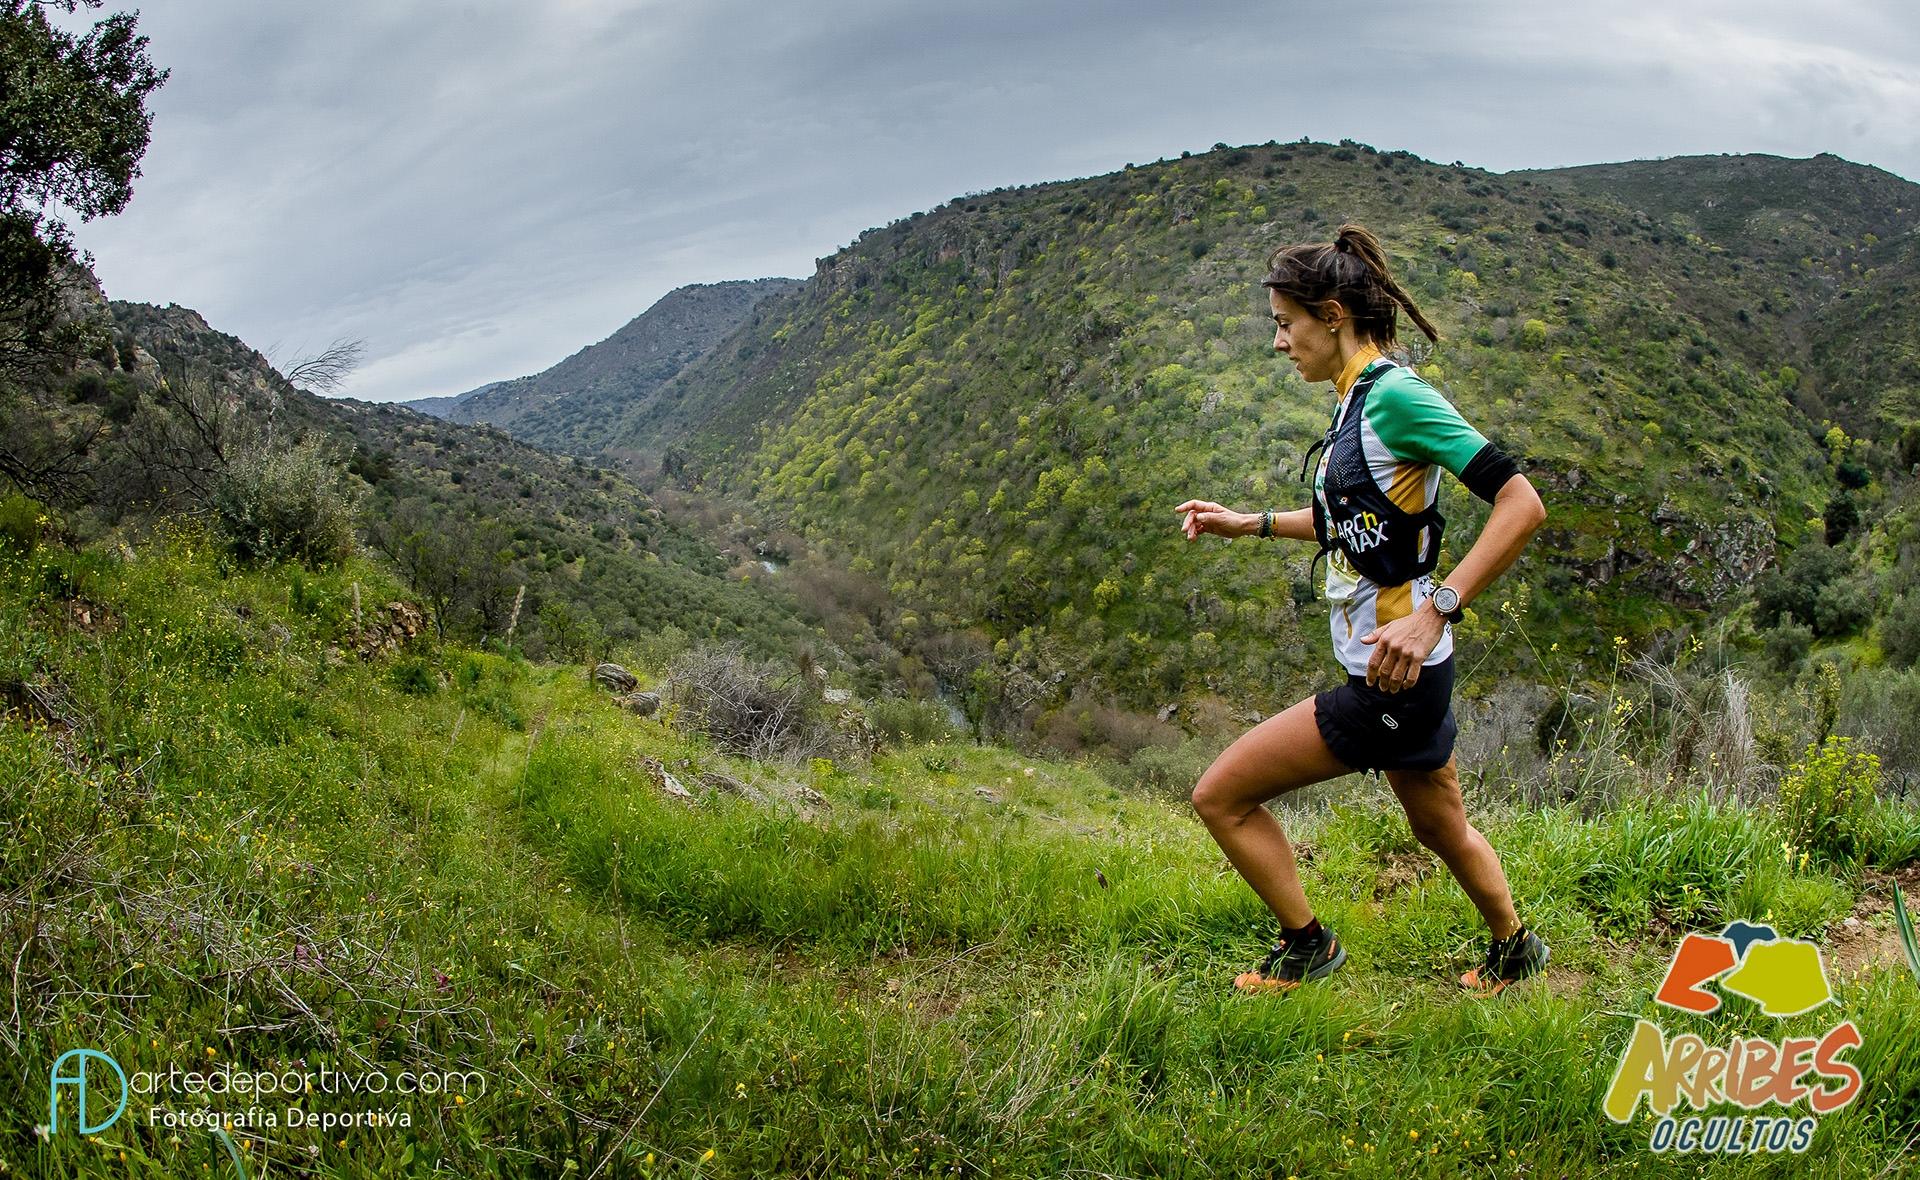 Slider 2020 - Arribes Ocultos Trail - 04